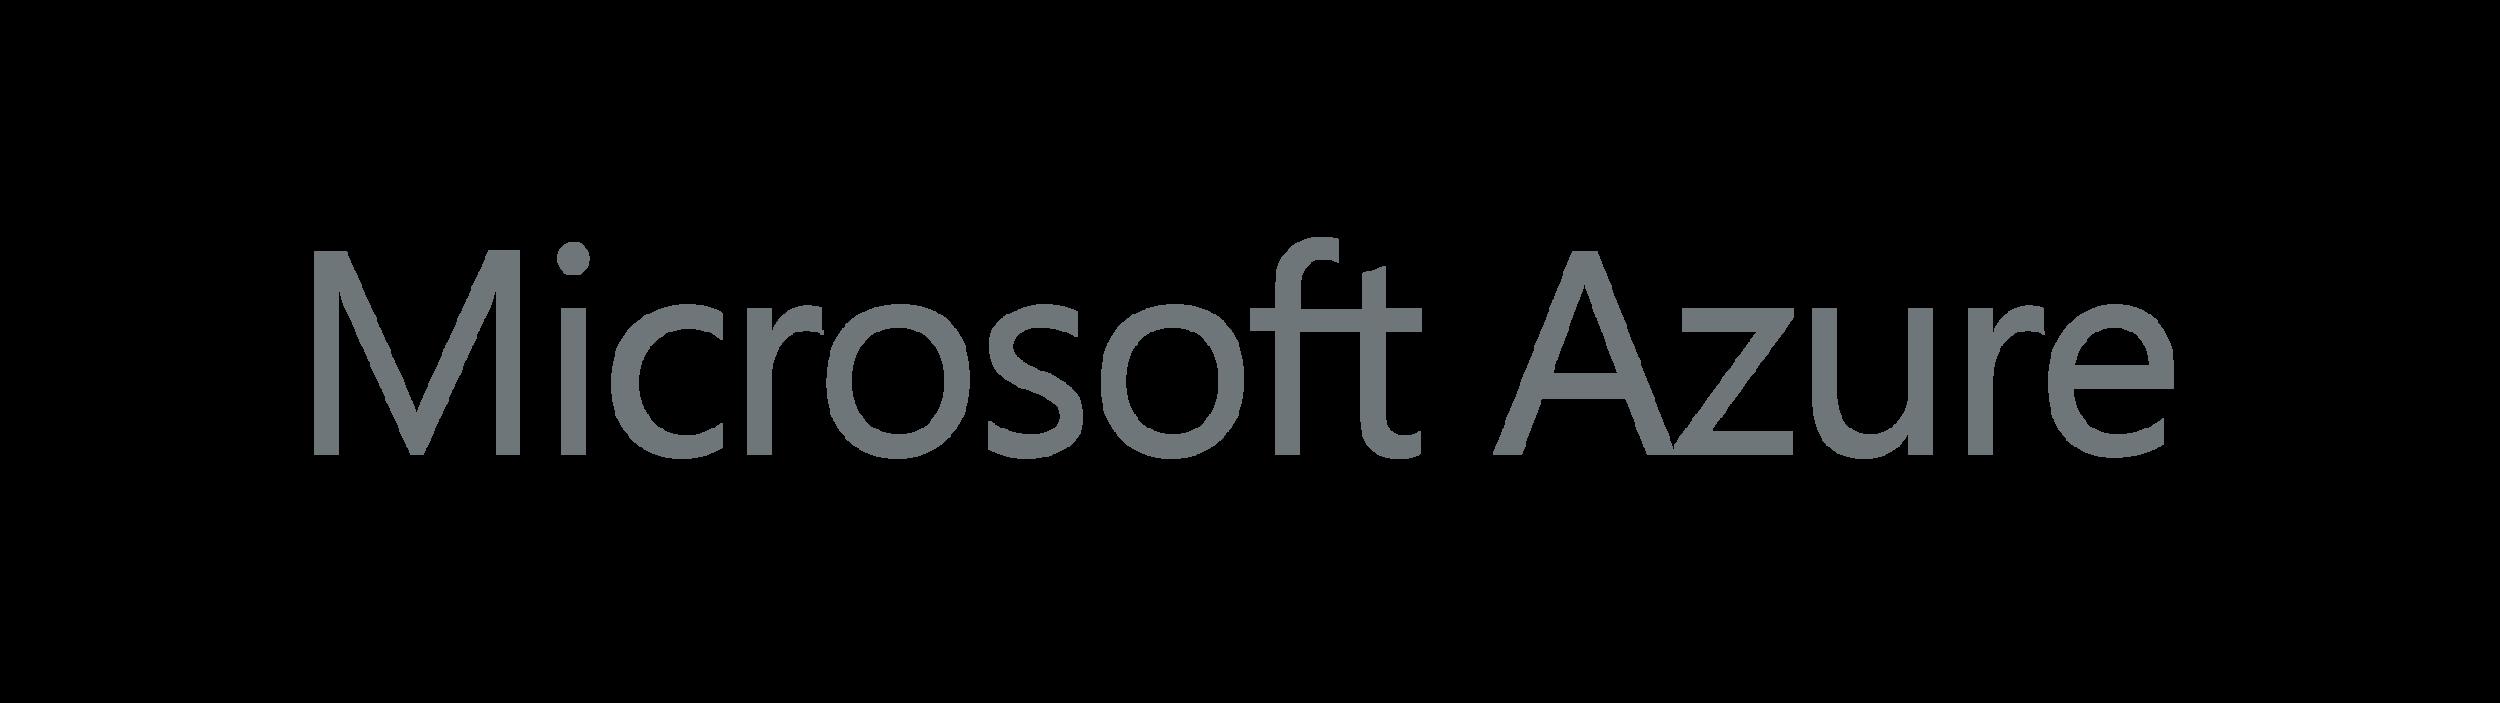 Microsoft_Azure_Logo_grey.png